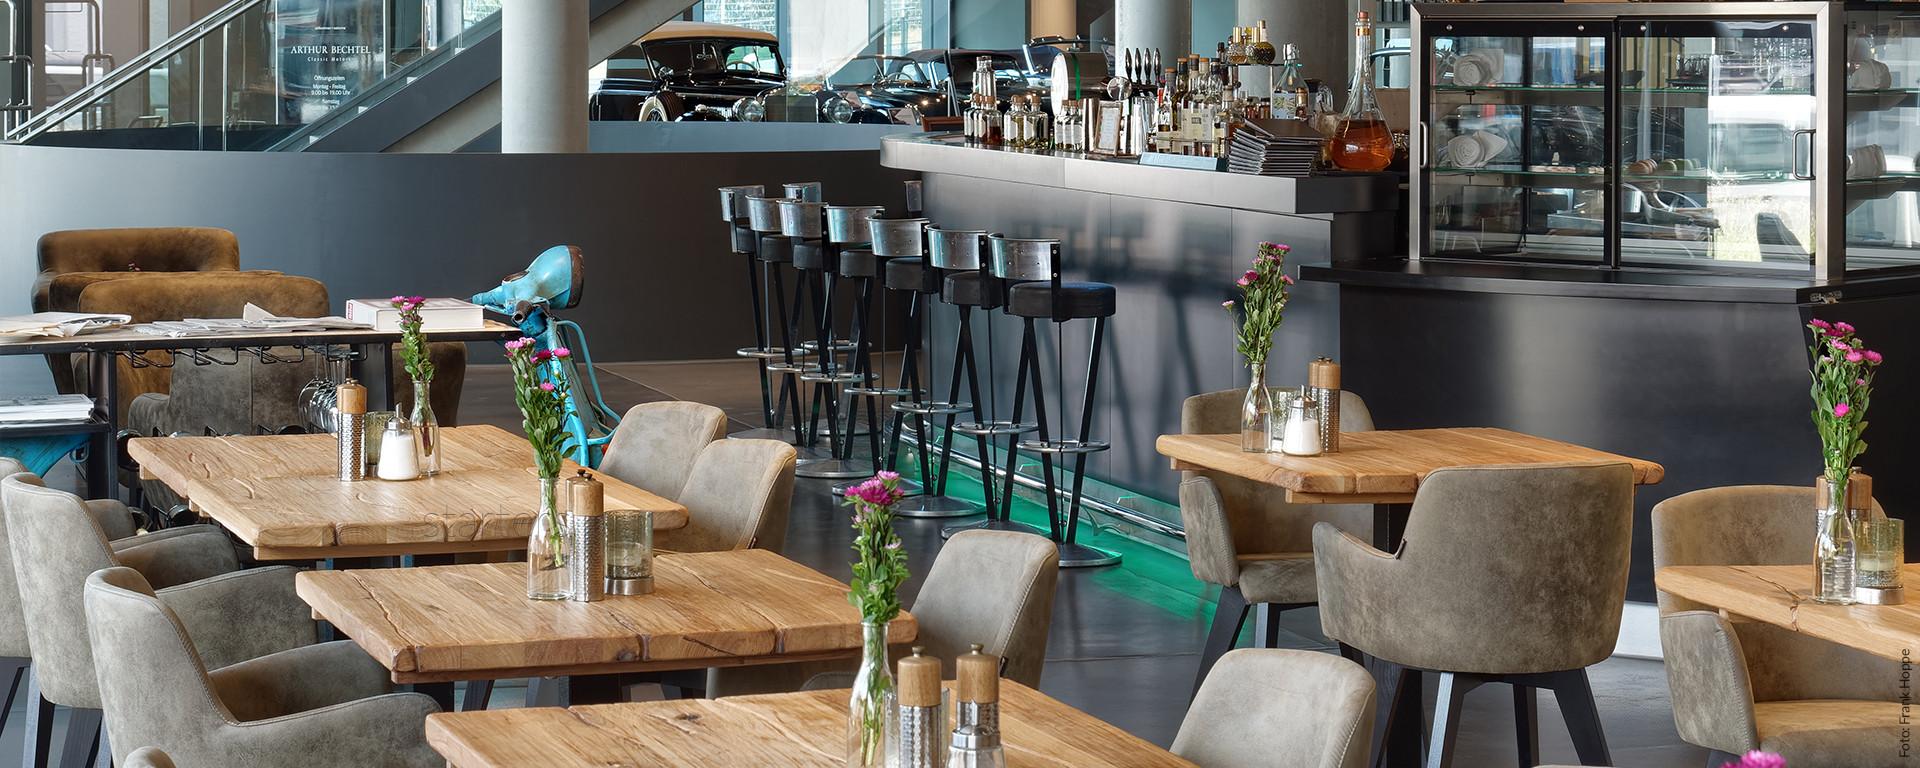 V8 HOTEL Restaurant & Bar PickUp